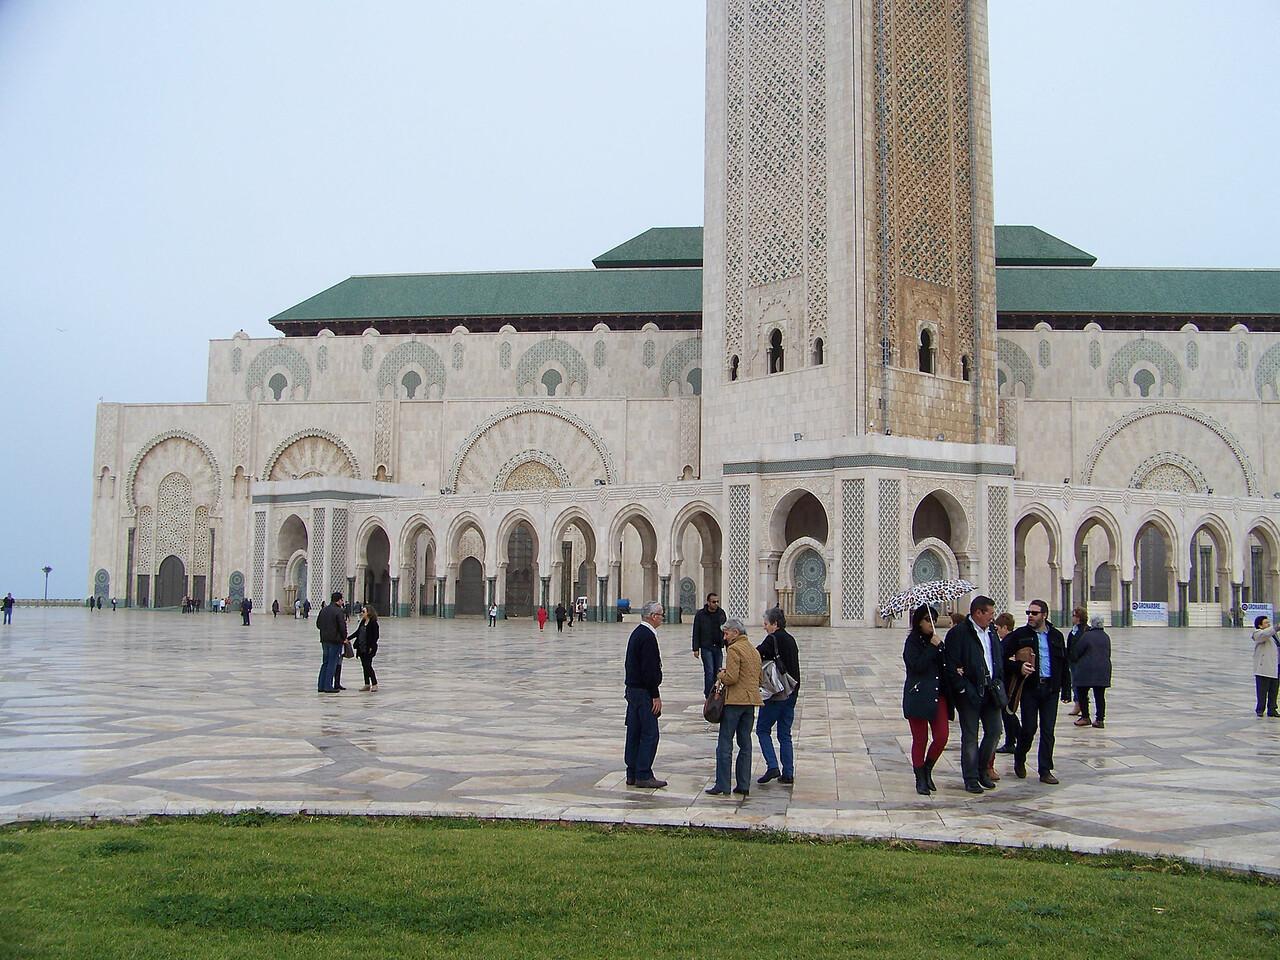 0031 - Hassan II Mosque - Casablanca Morocco.JPG